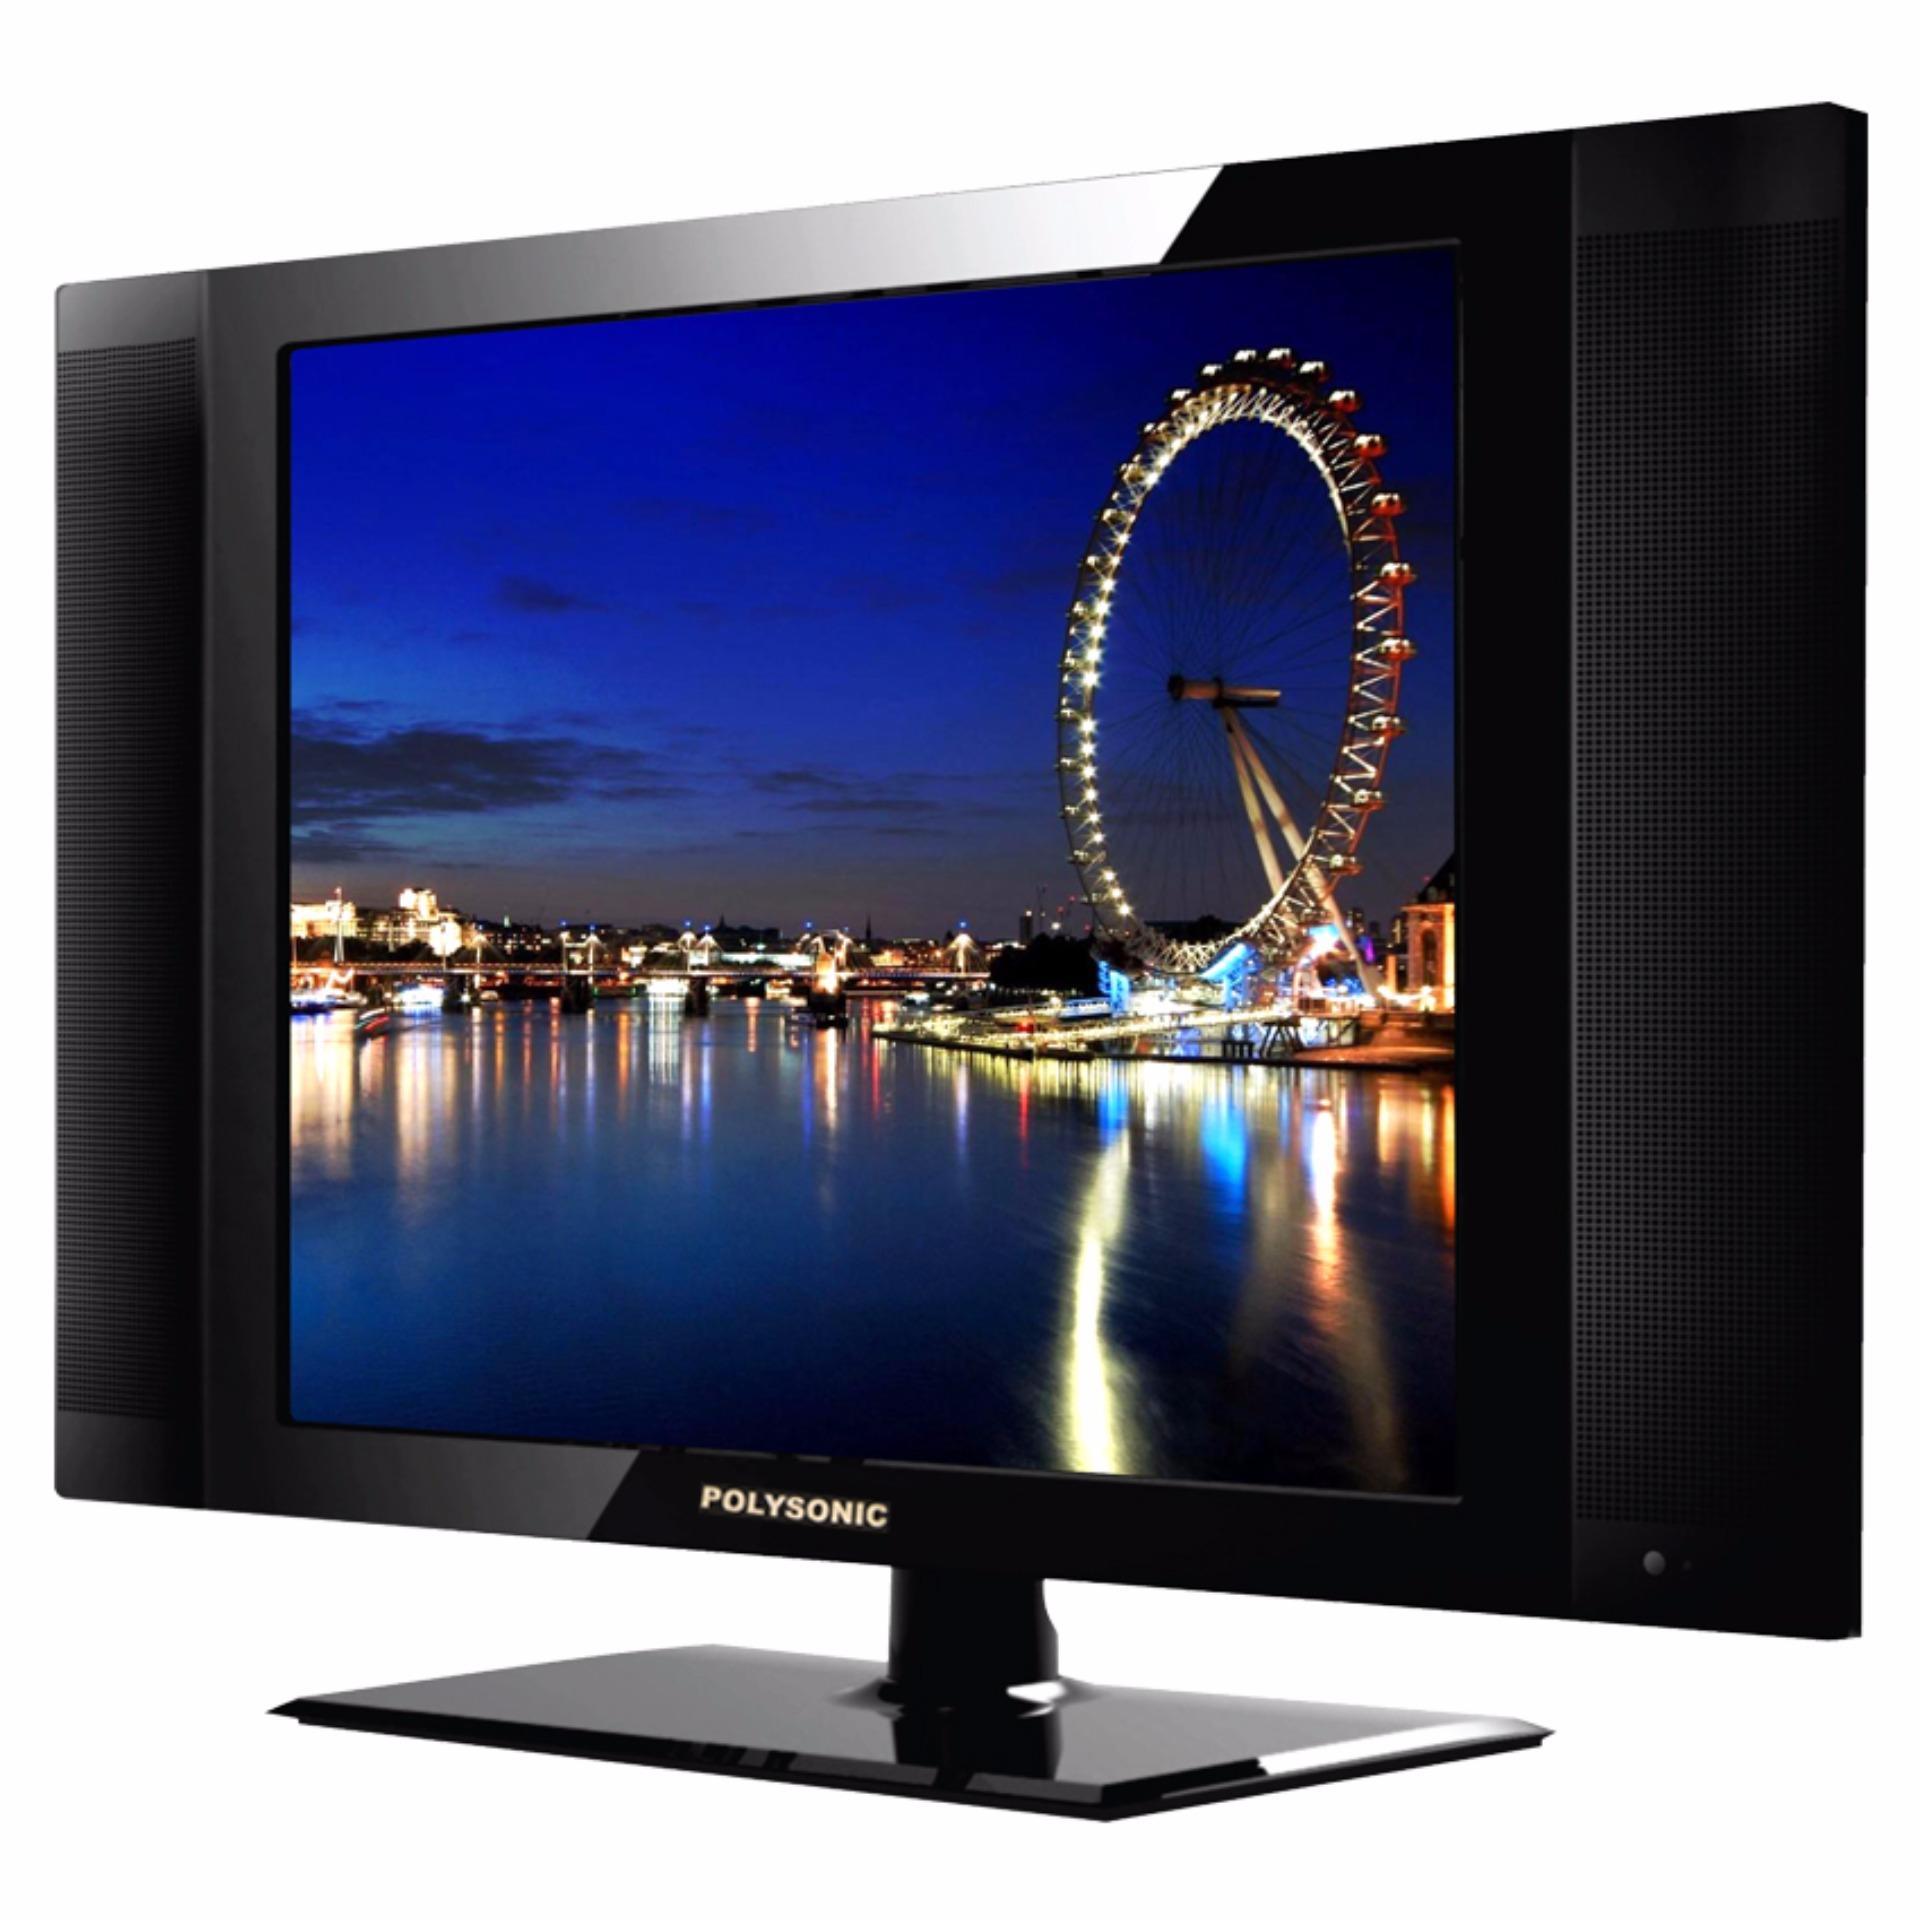 Polysonic LED TV 17 1777 - Hitam